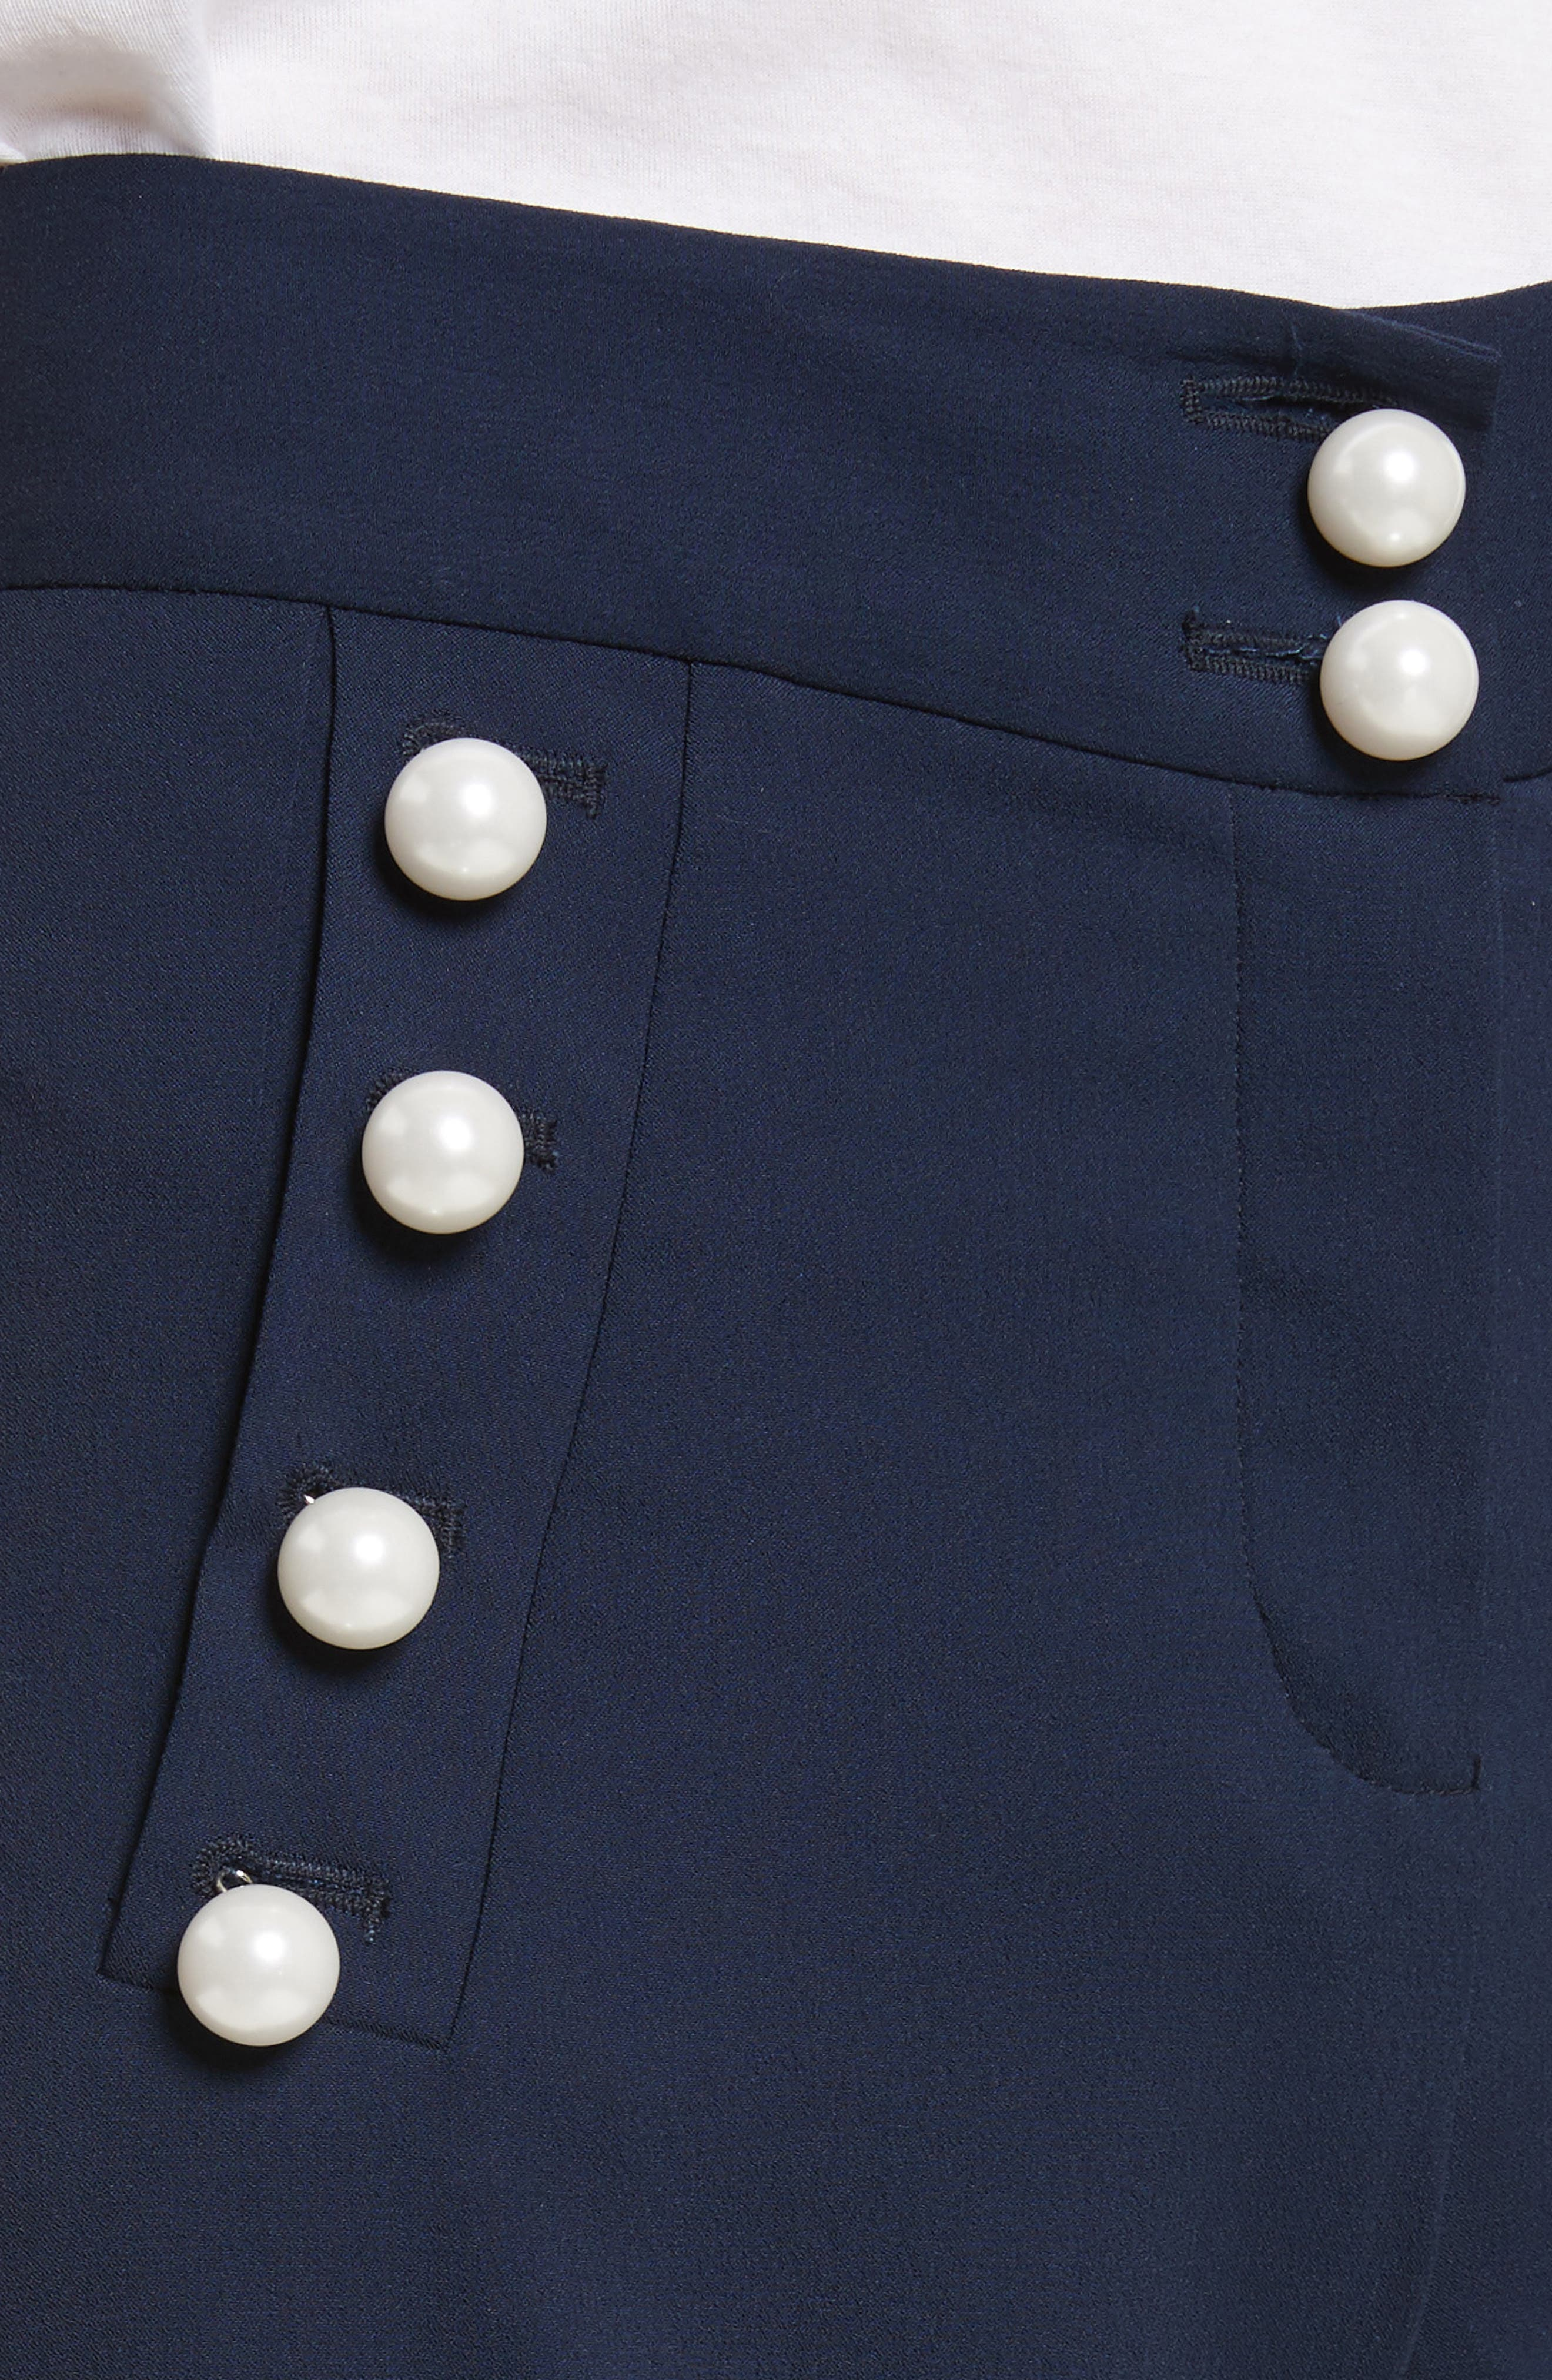 Adley Sailor Pants,                             Alternate thumbnail 5, color,                             Navy